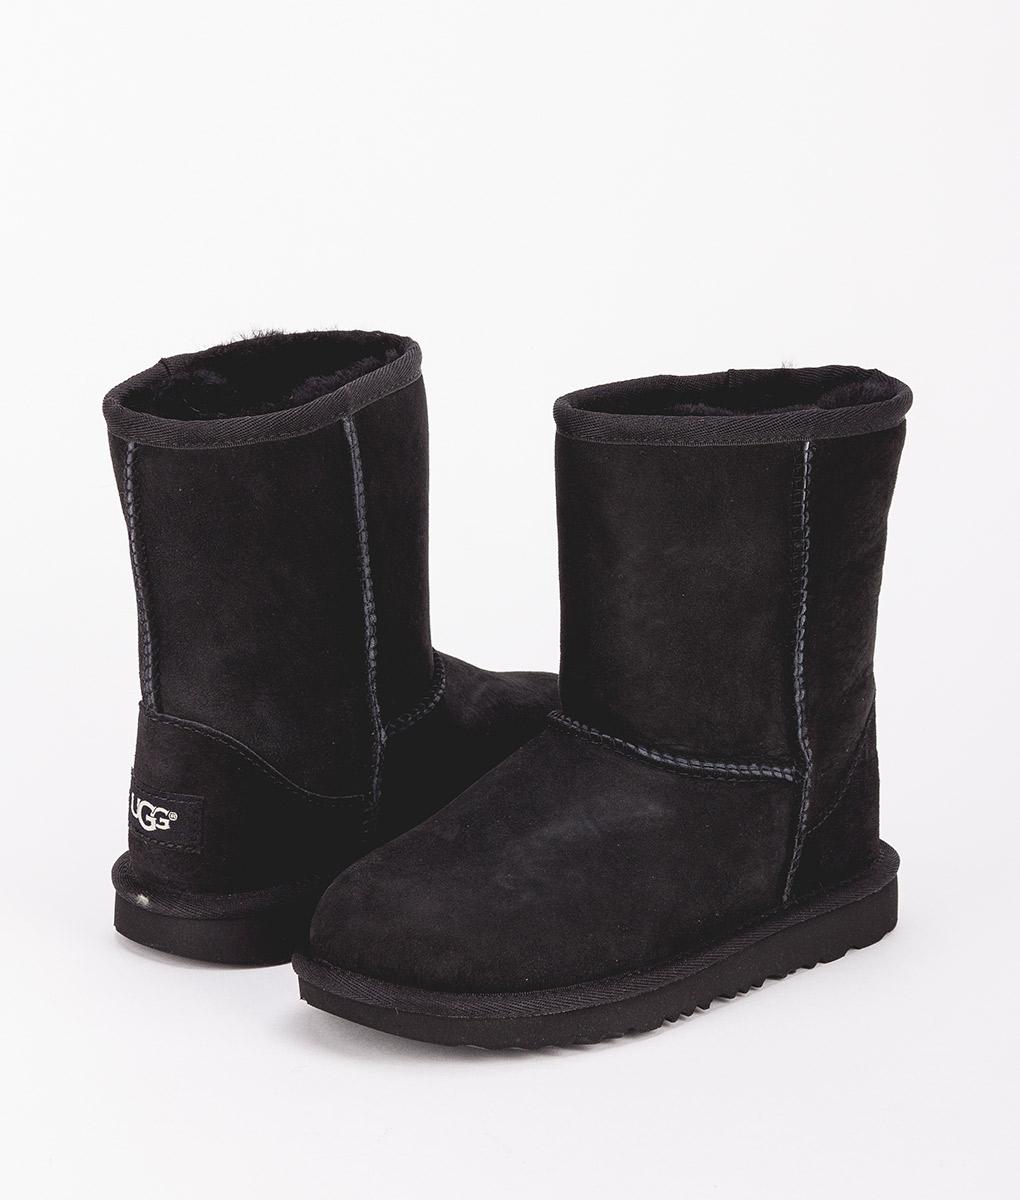 UGG Kids Ankle Boots 1017703K CLASSIC II, Black 1